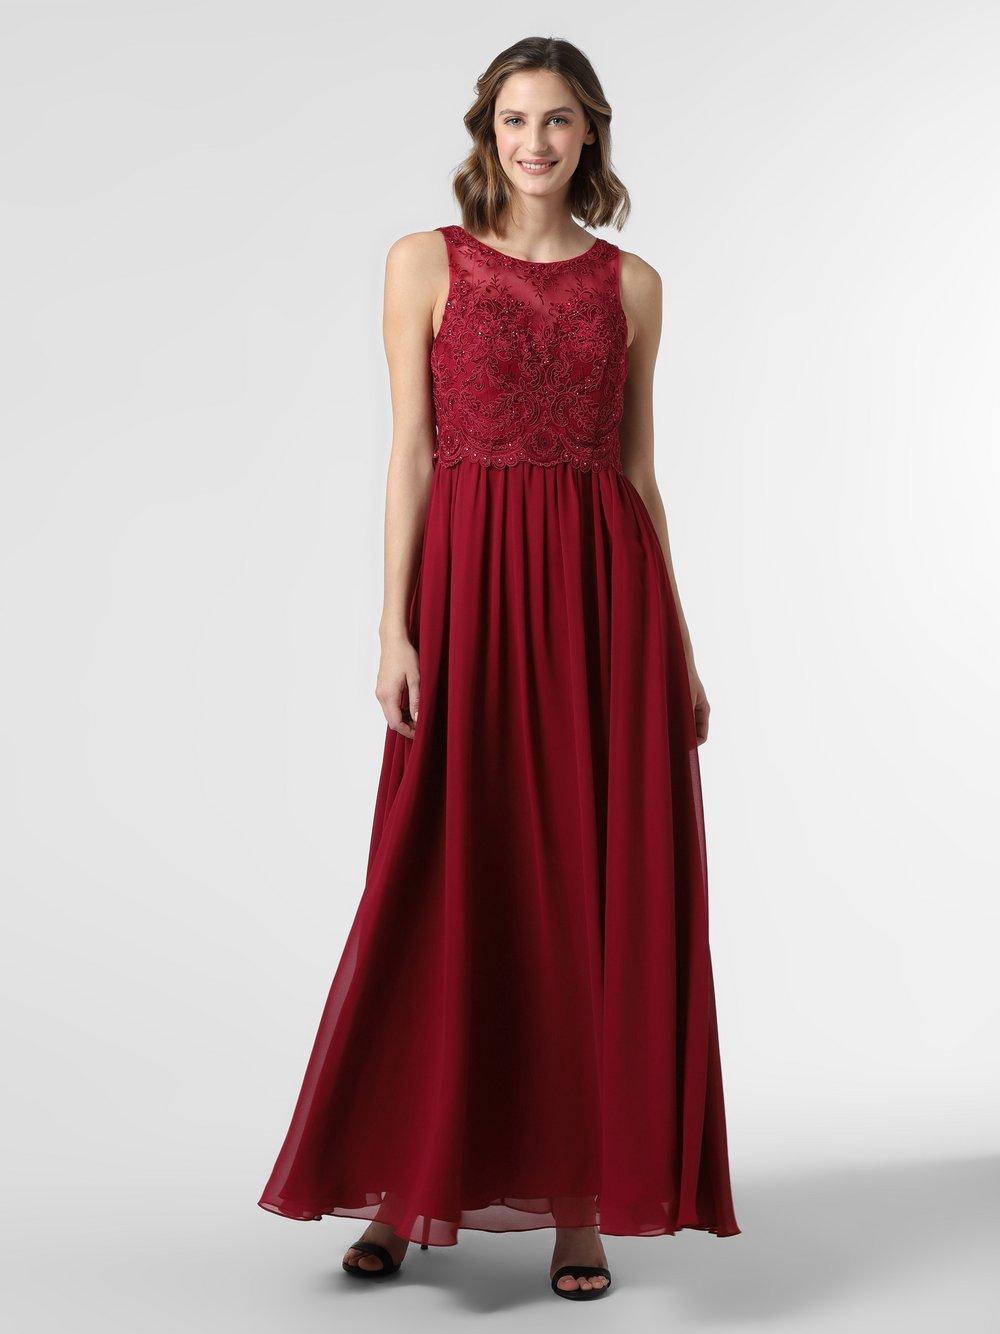 Laona – Damska sukienka wieczorowa, różowy Van Graaf 466892-0002-00380